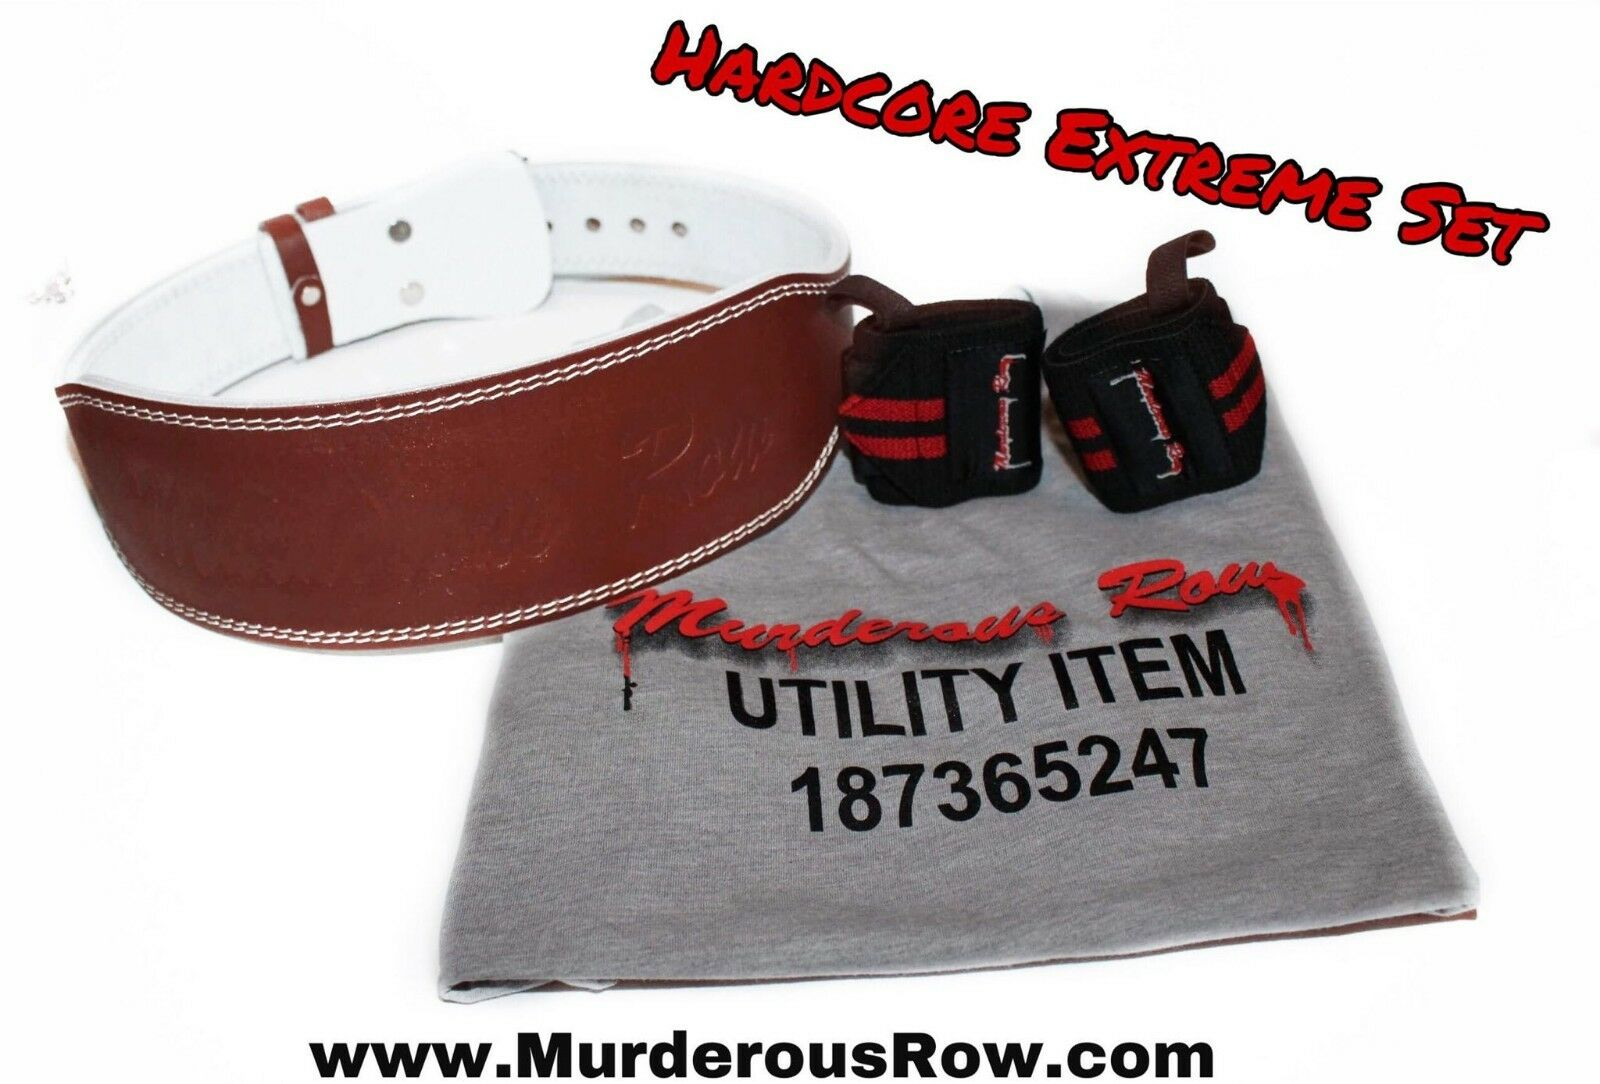 Murderous Row WeightLifting Genuine Leather Belt (LARGE) +  Wrist Wraps + Shirt  best fashion